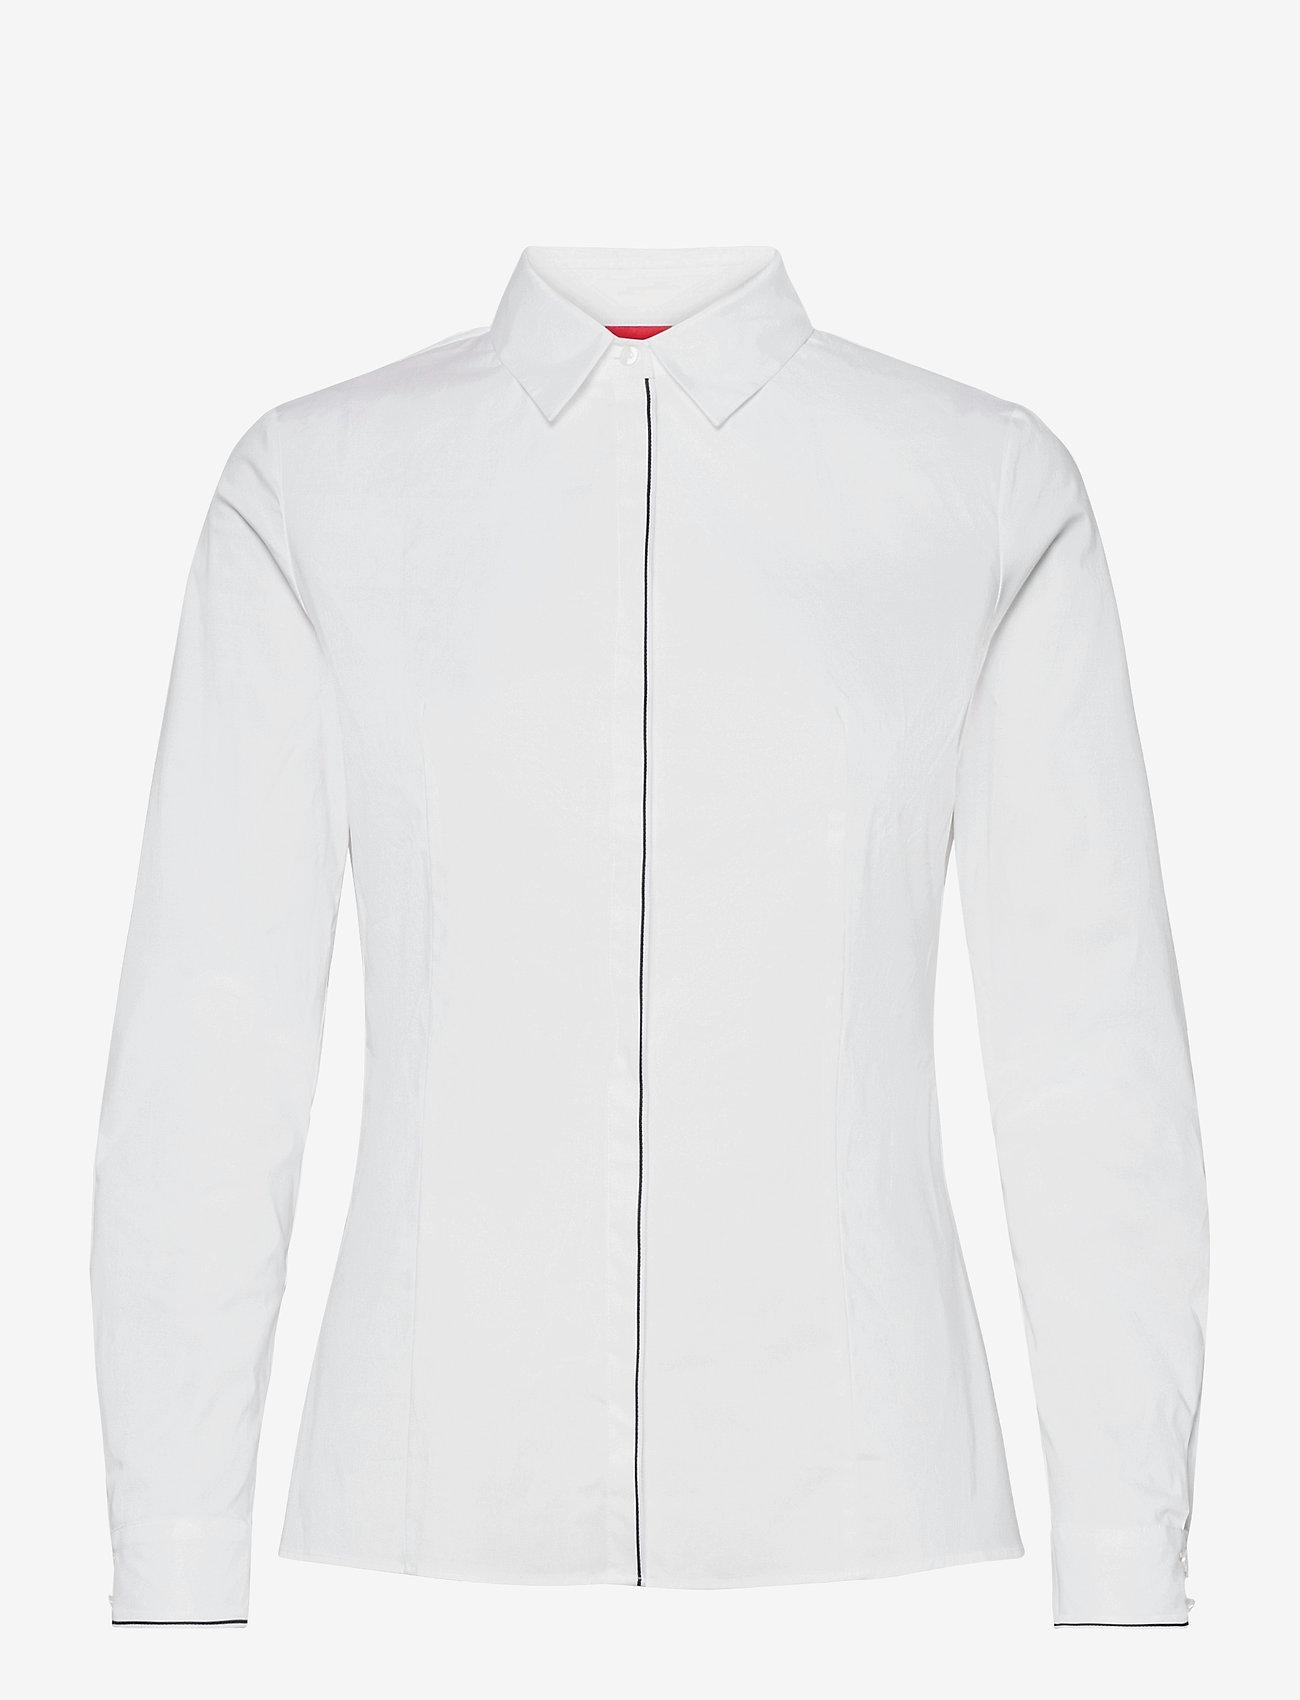 HUGO - Etrina1 - blouses à manches longues - white - 0